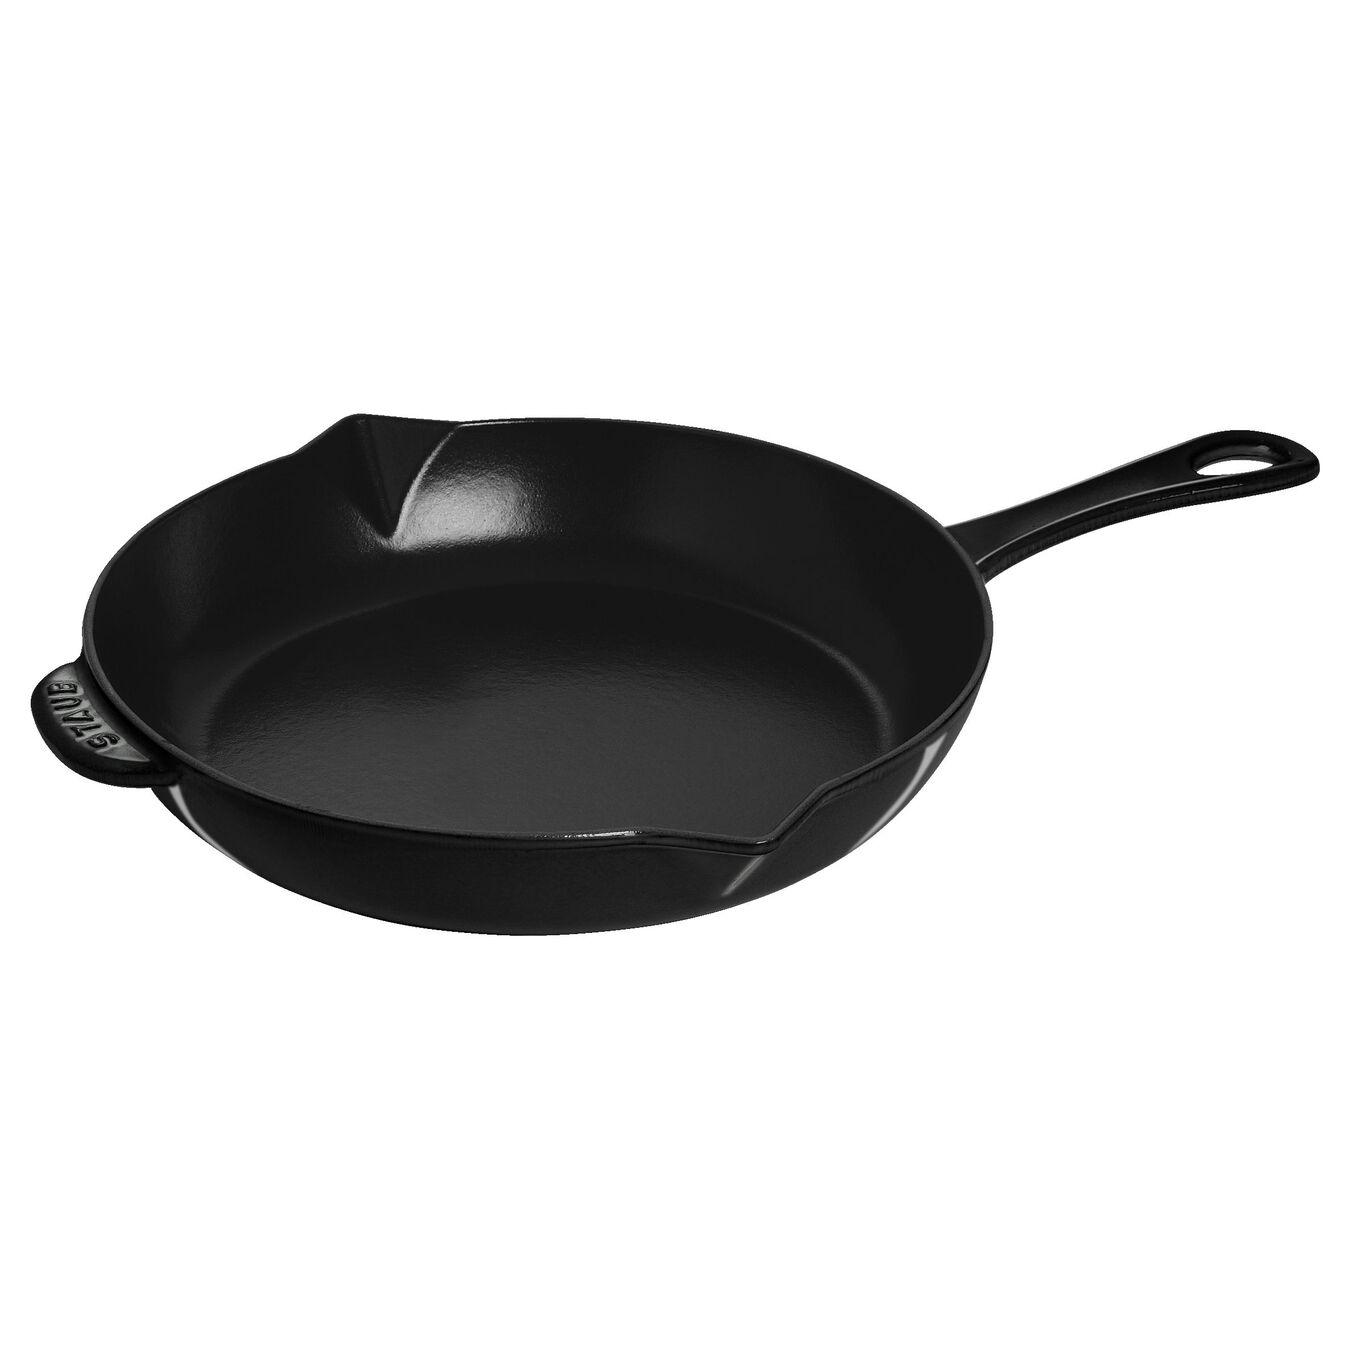 10-inch, Frying pan, shiny black,,large 1